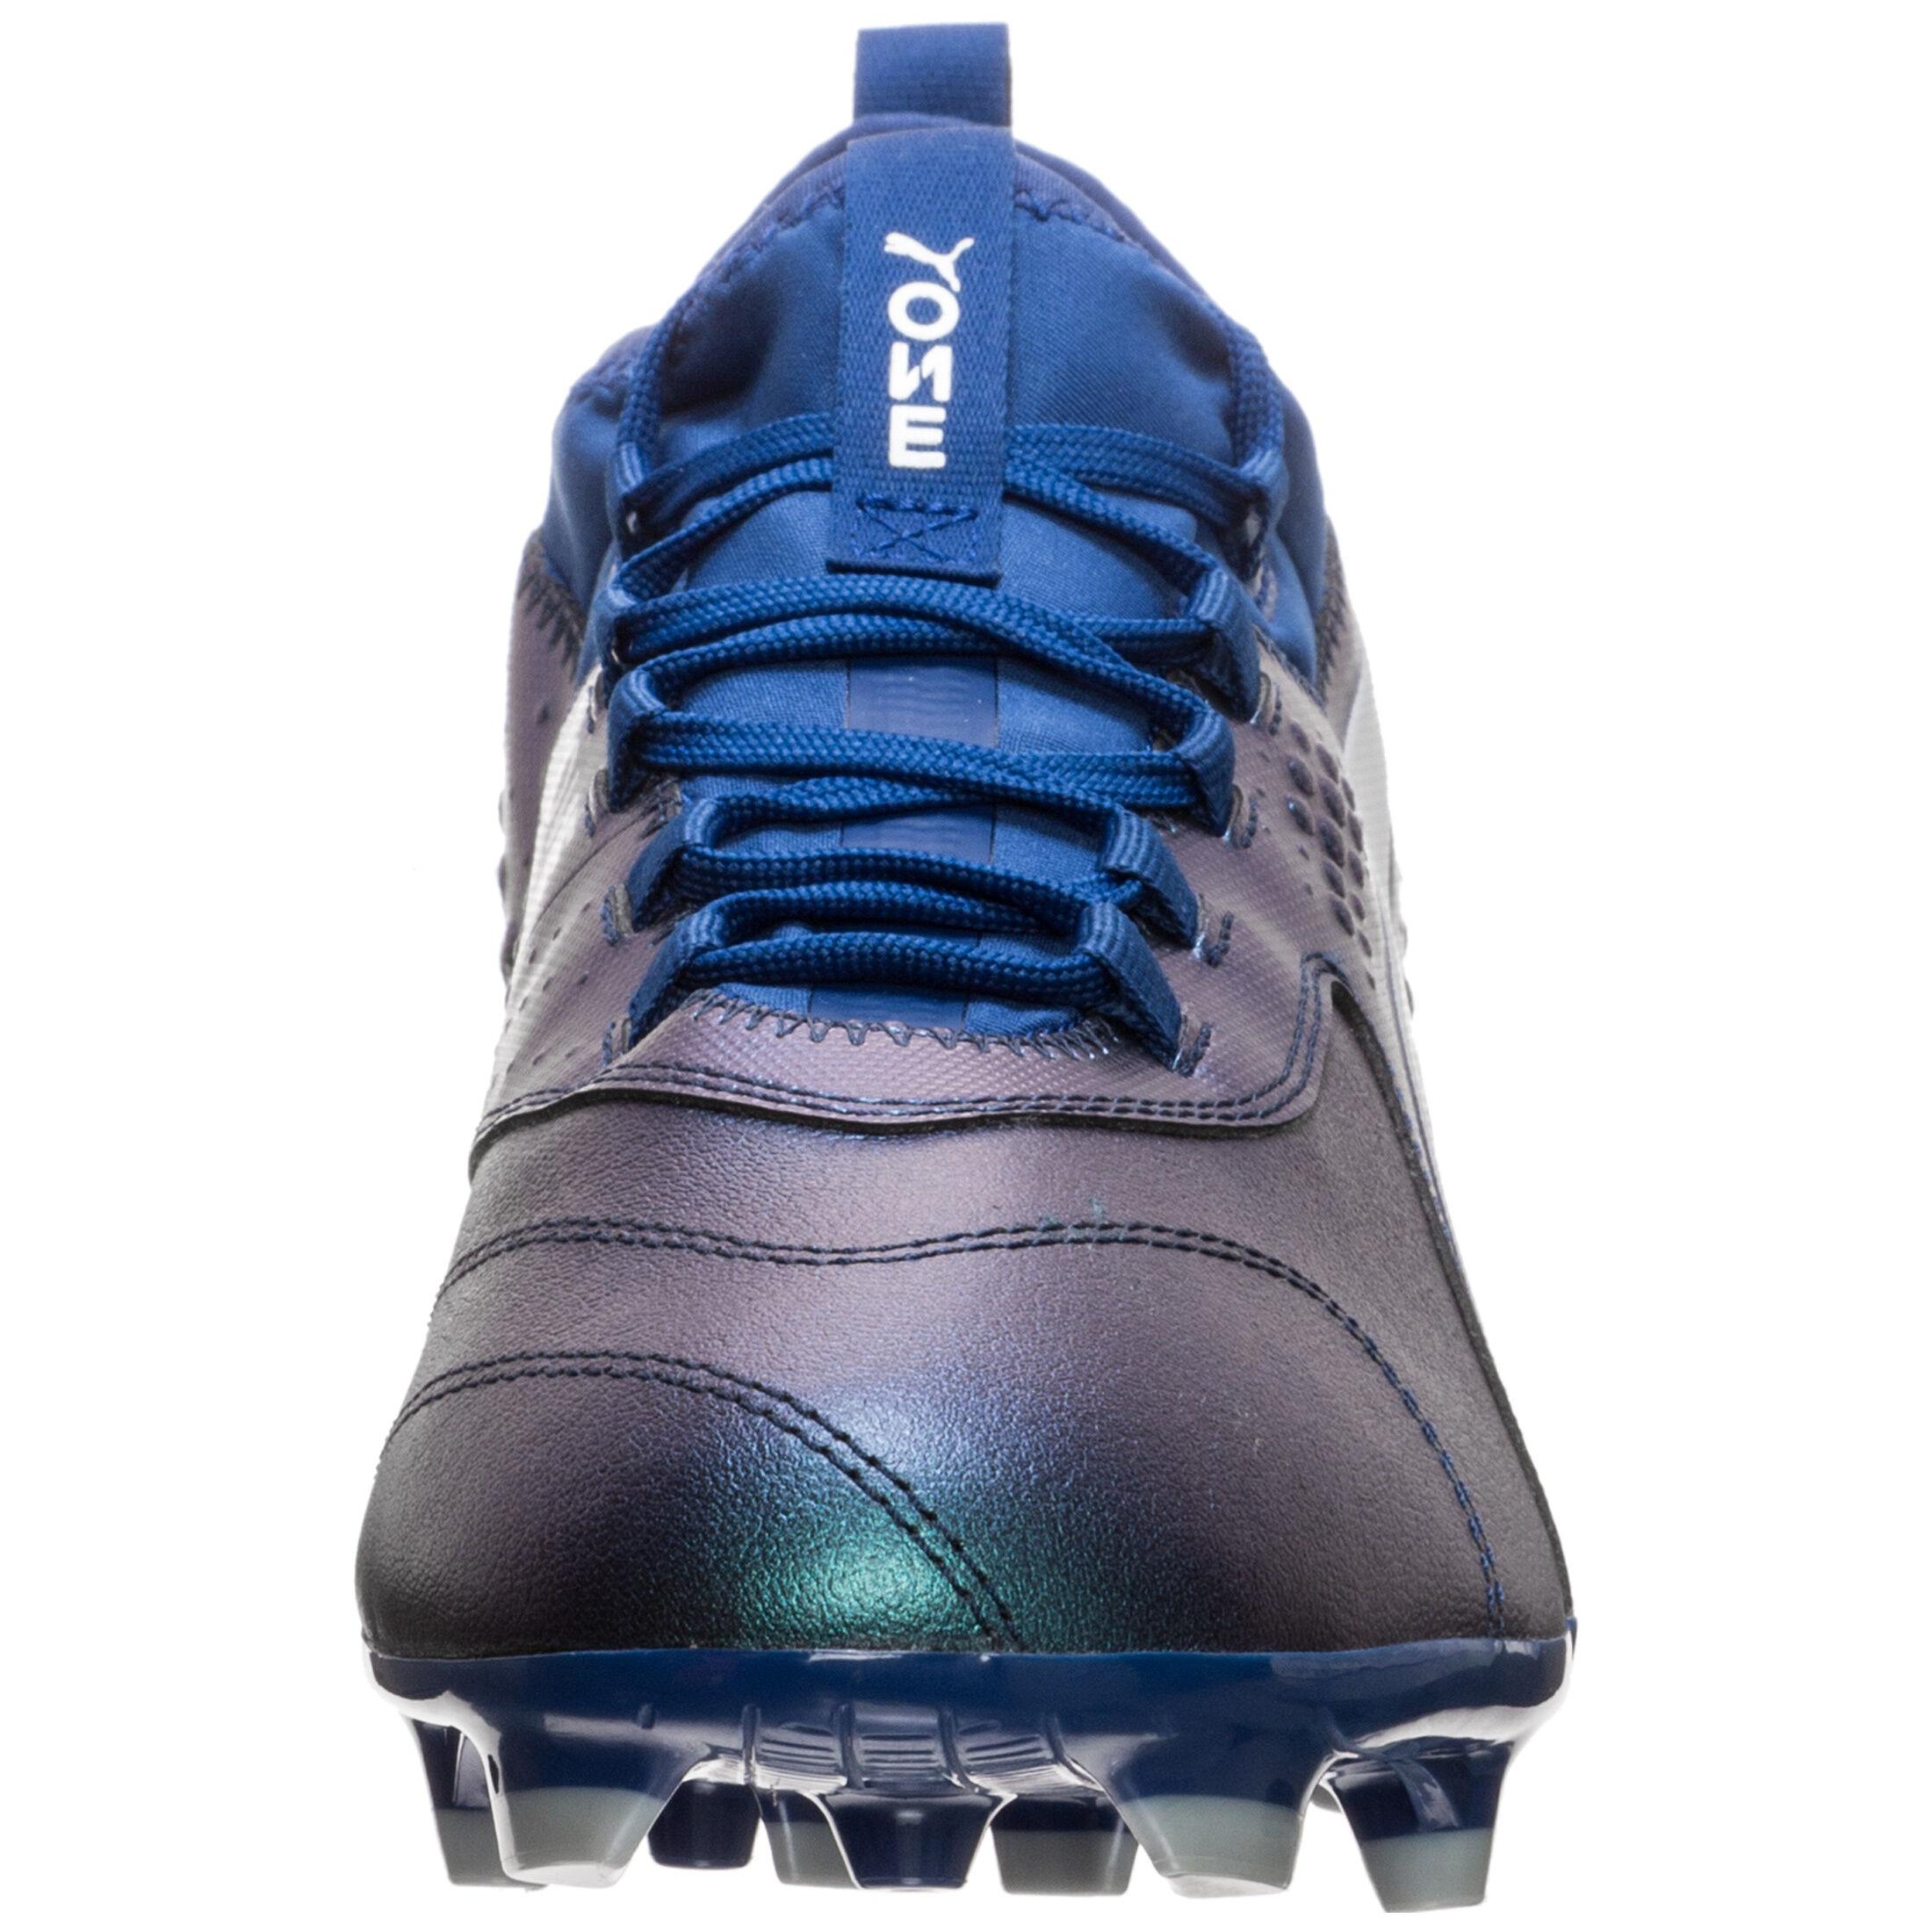 ONE 3 Leather AG Fußballschuh Herren